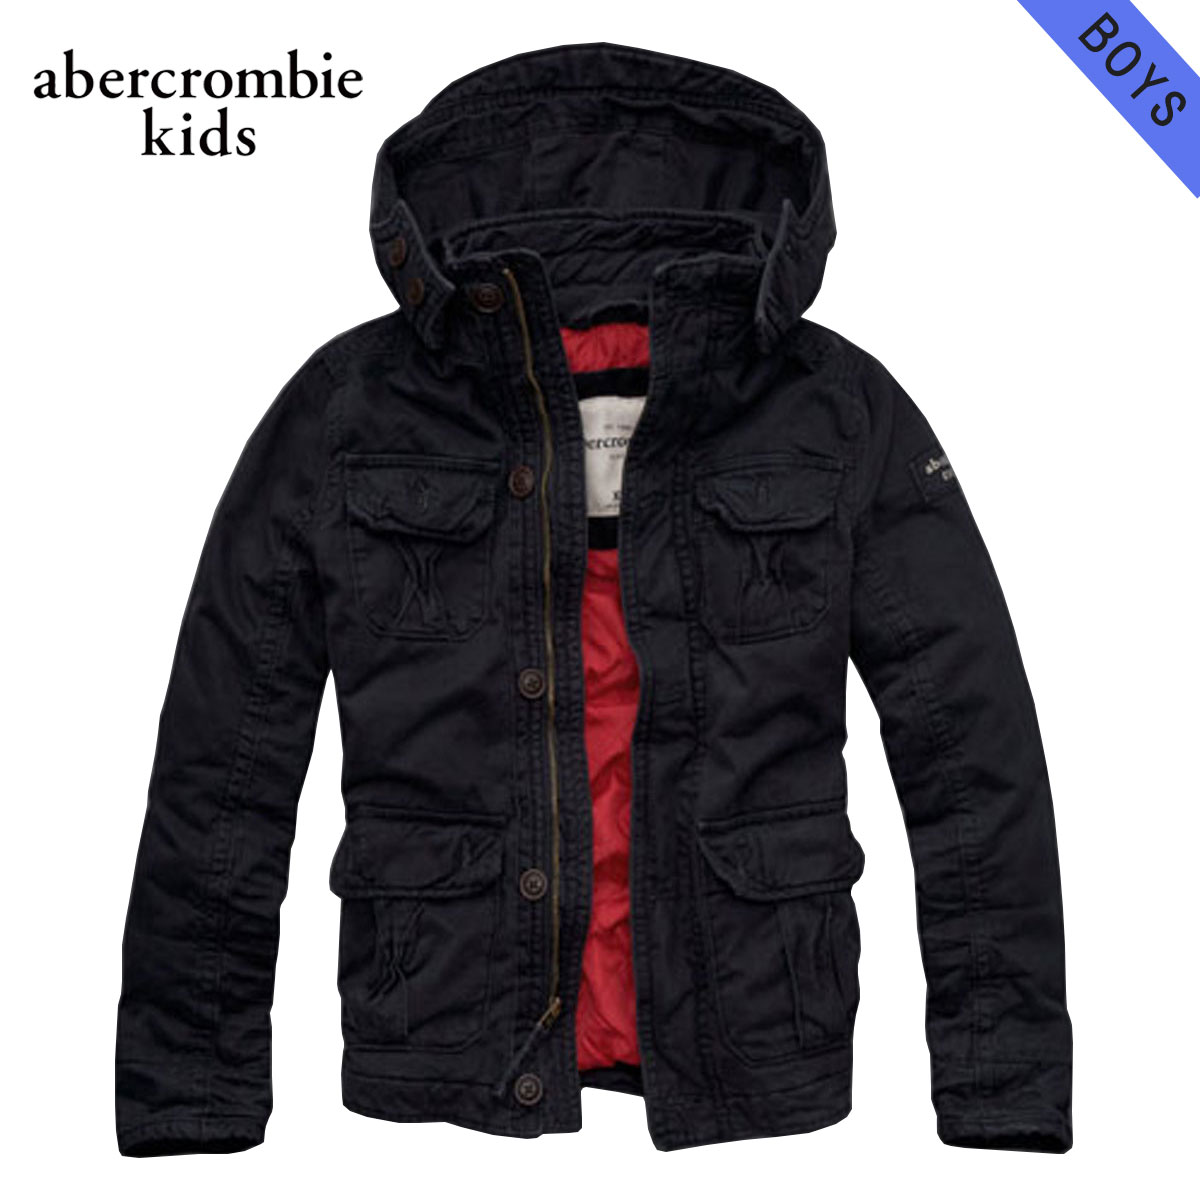 c2eff02662a21 ABBA black kids AbercrombieKids regular article children's clothes Boys  jacket a&f all-season ...